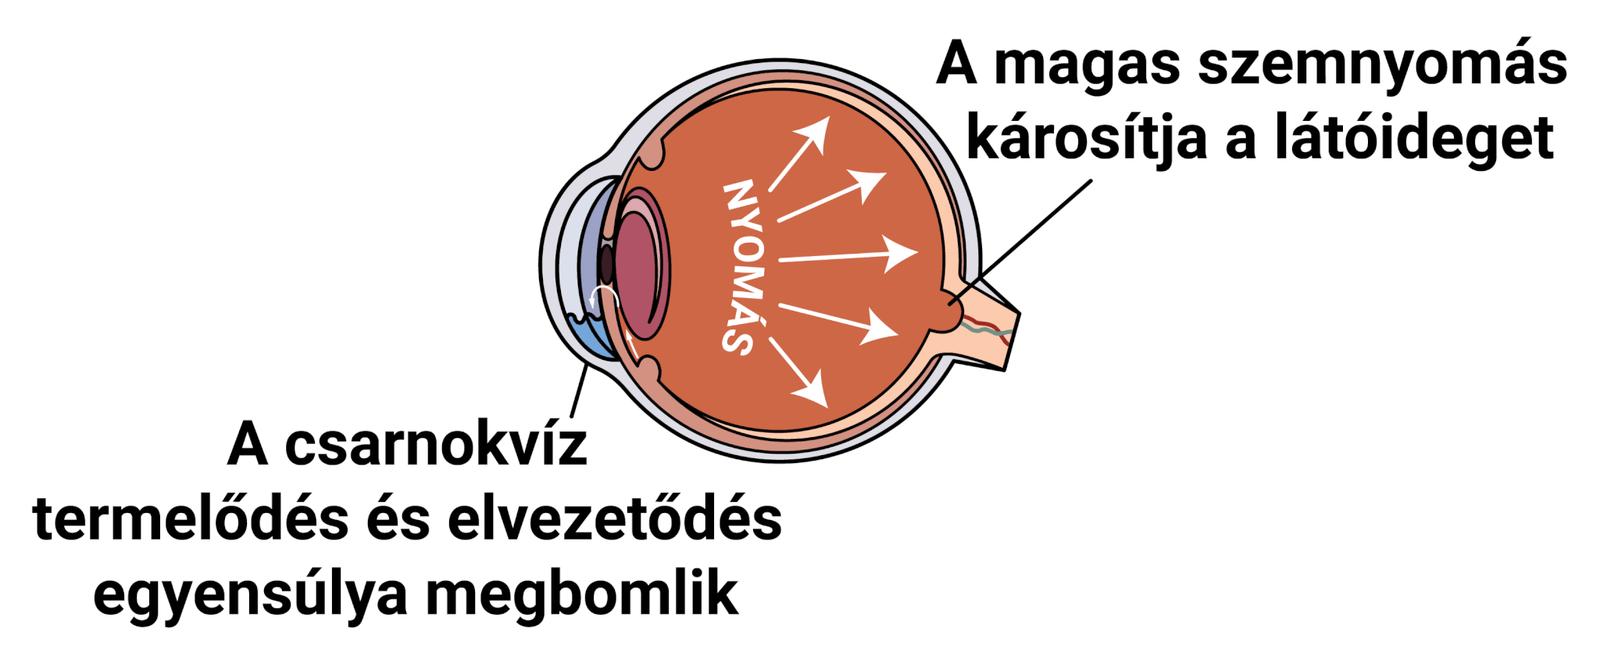 papaverin látás